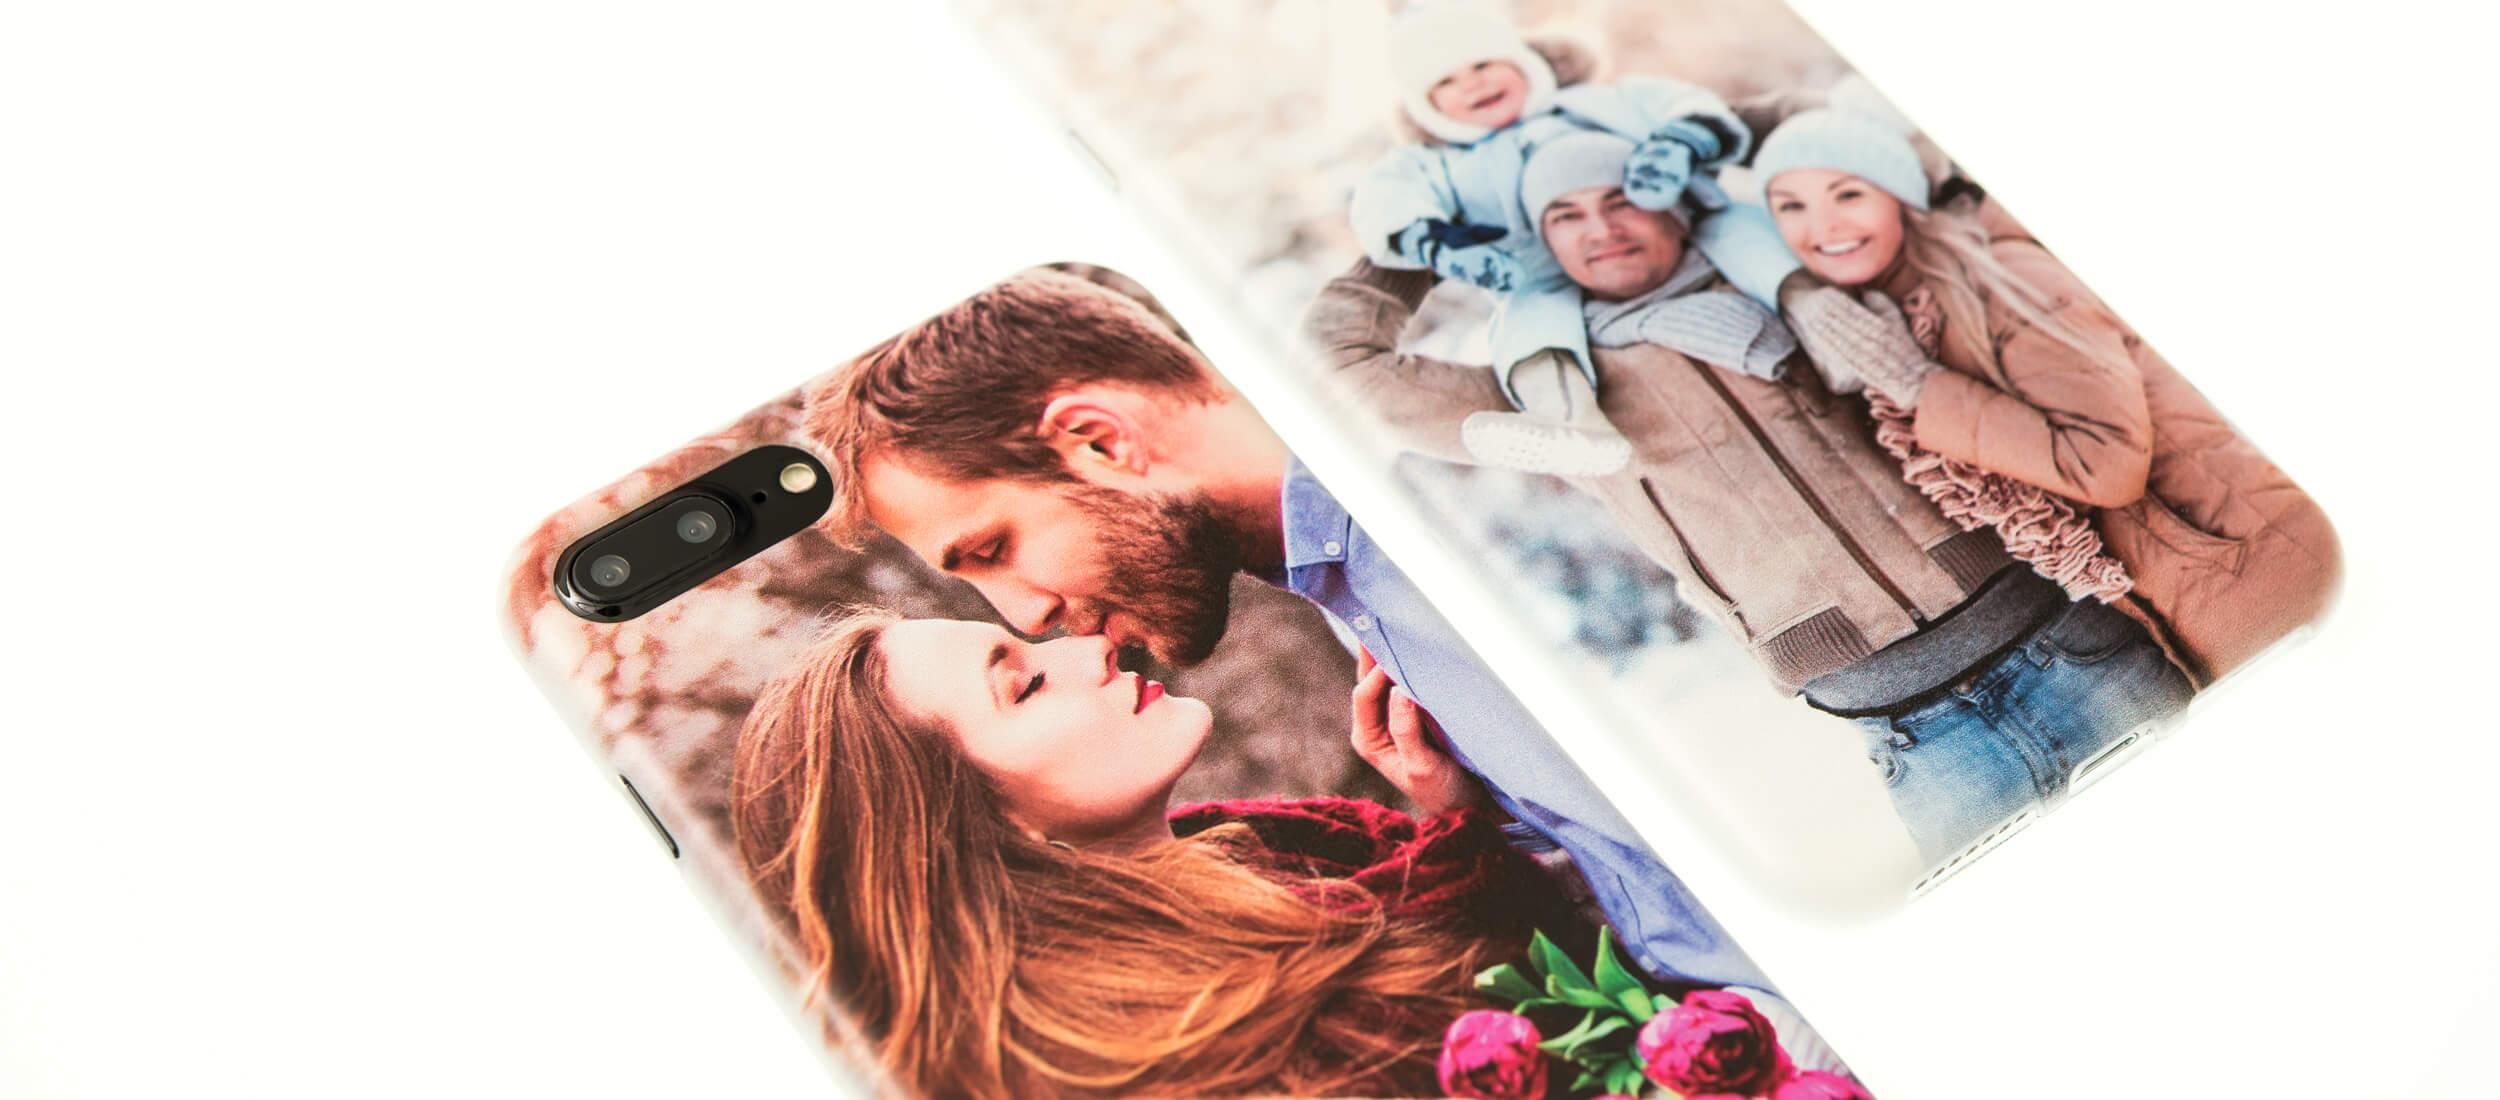 cover-iphone-7-plus-personalizzate_02